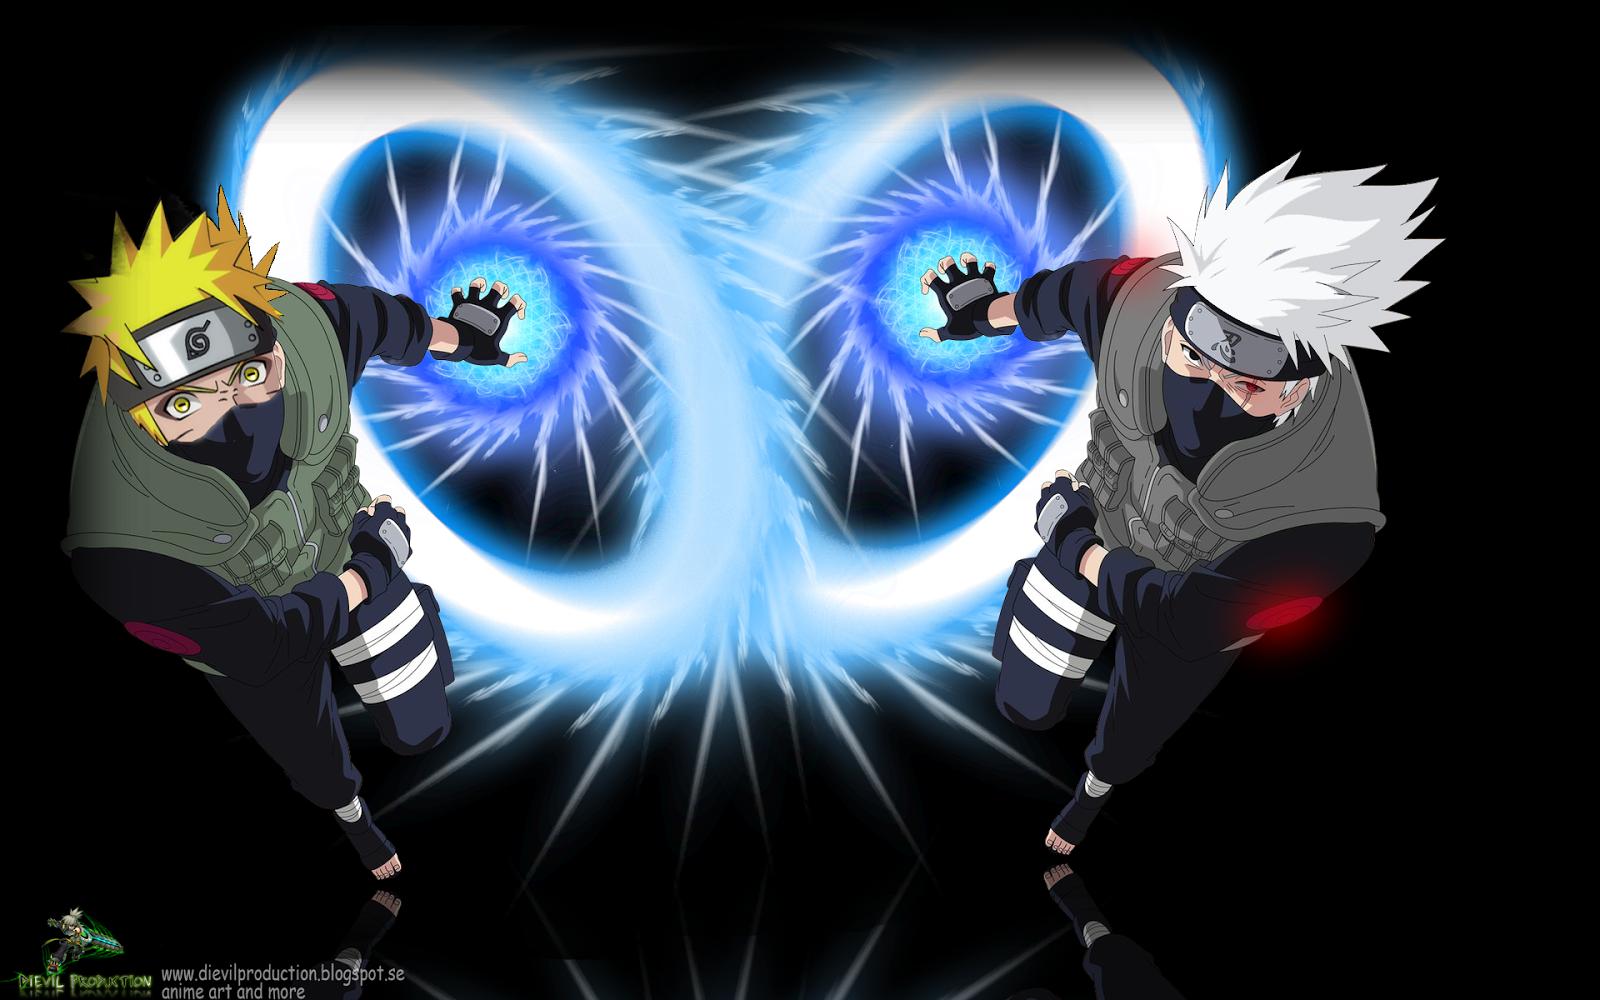 Kakashi Naruto 1108 Wallpapers Anime HD Wallpaper 1600x1000